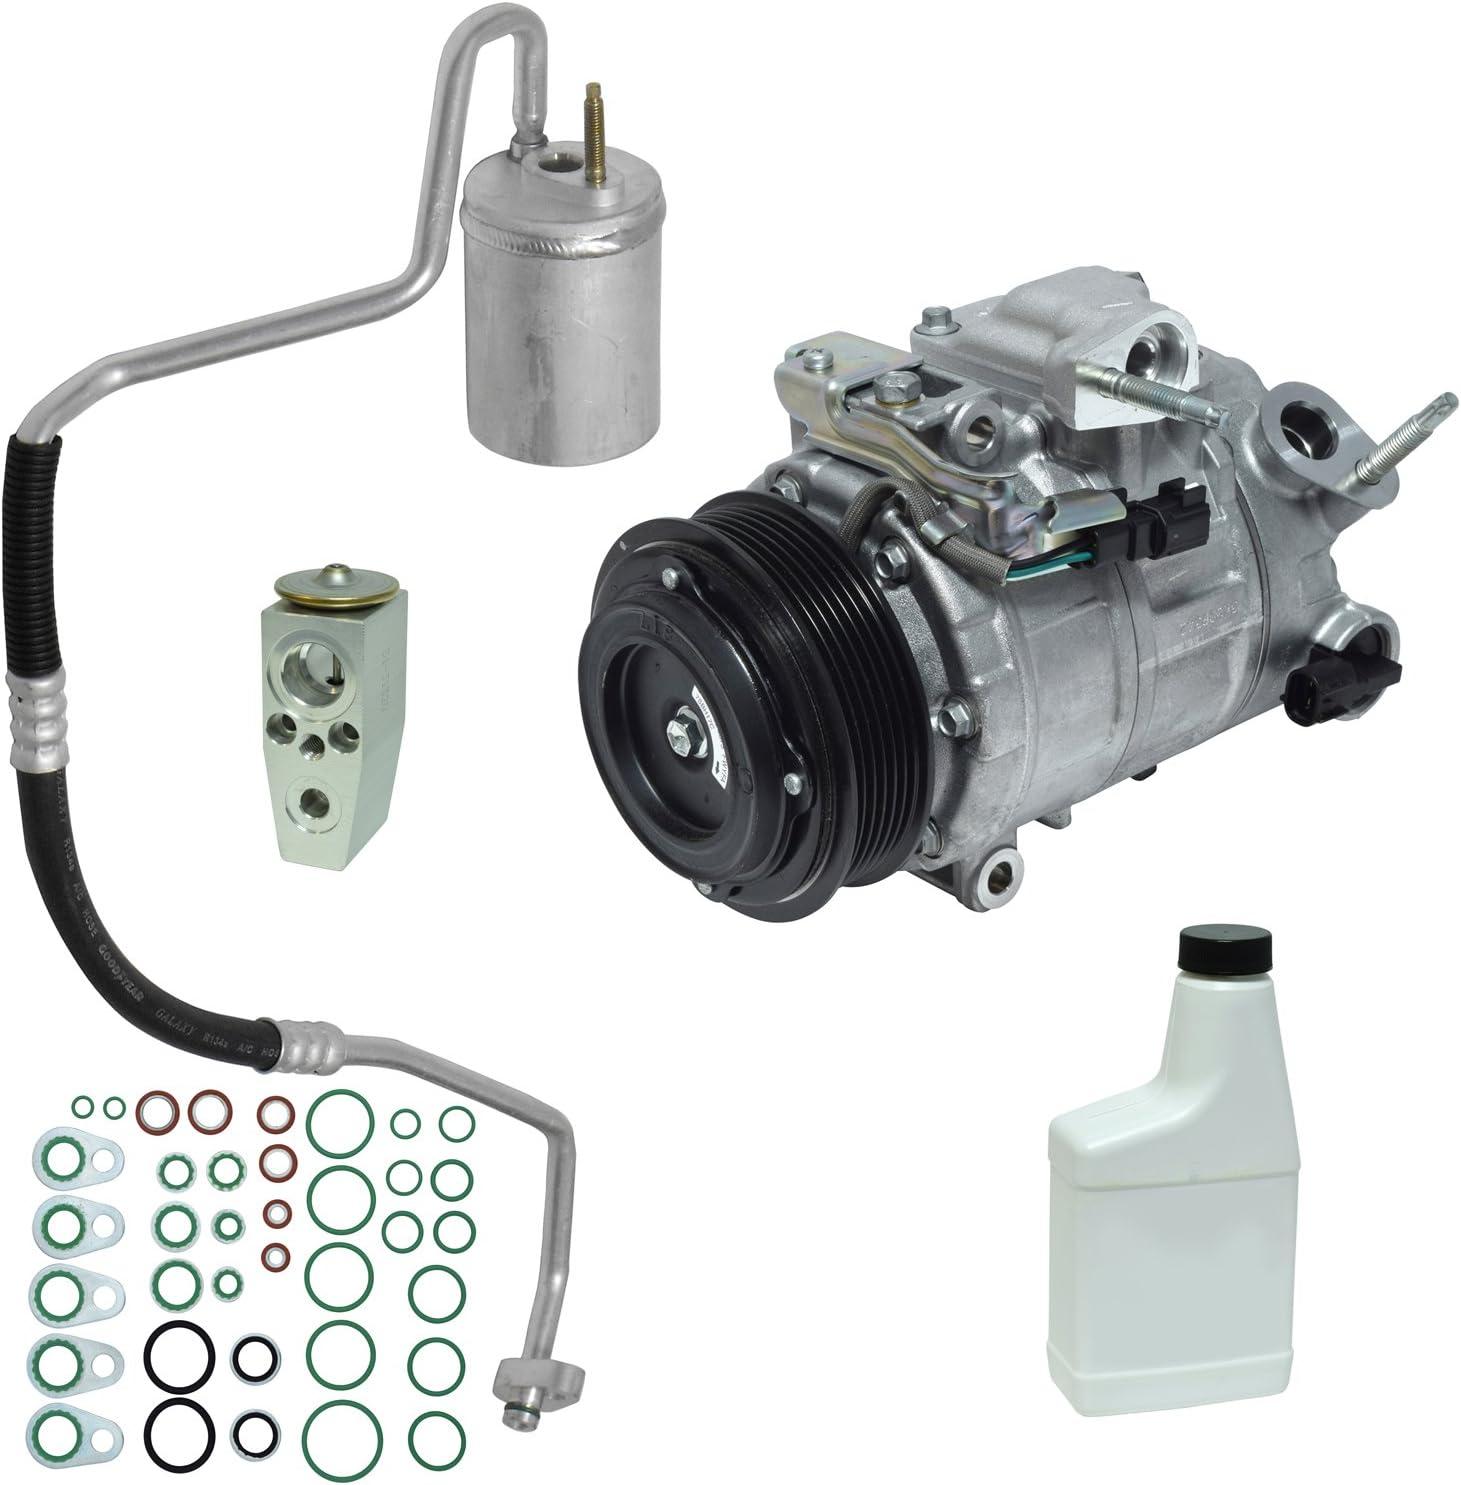 UAC KT 5160 A//C Compressor and Component Kit